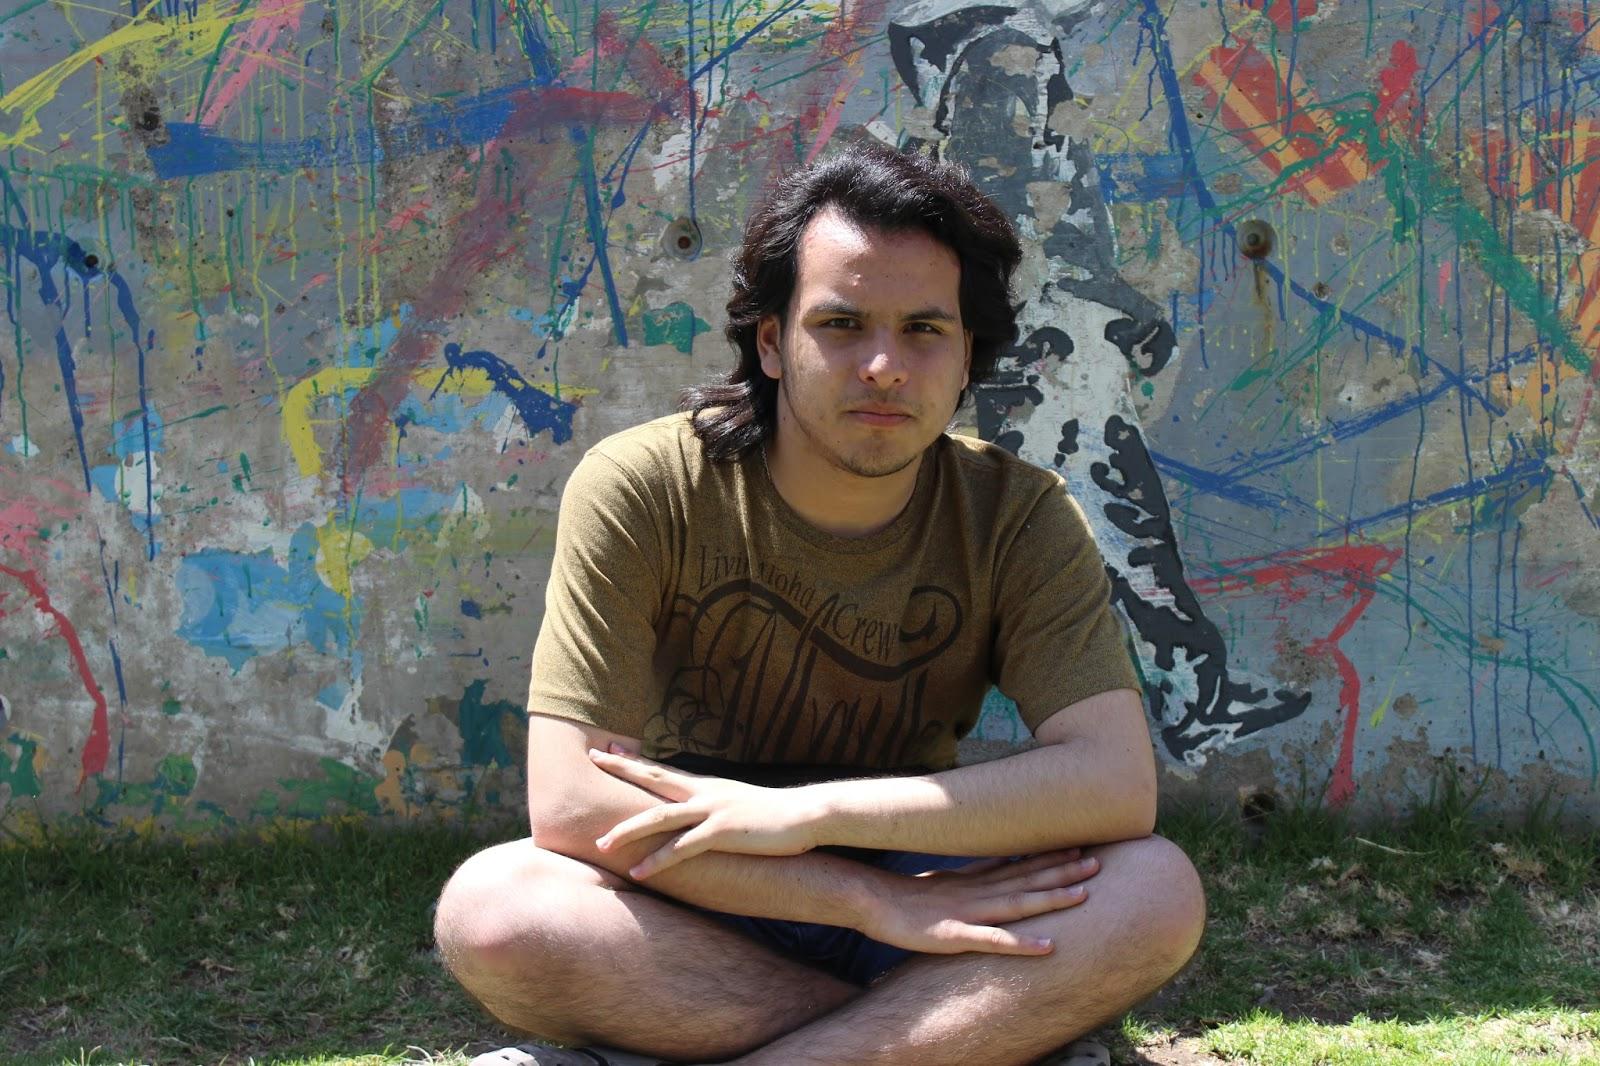 Altamirano destacado: Jorge Moreno, crea sorprendente disco conceptual